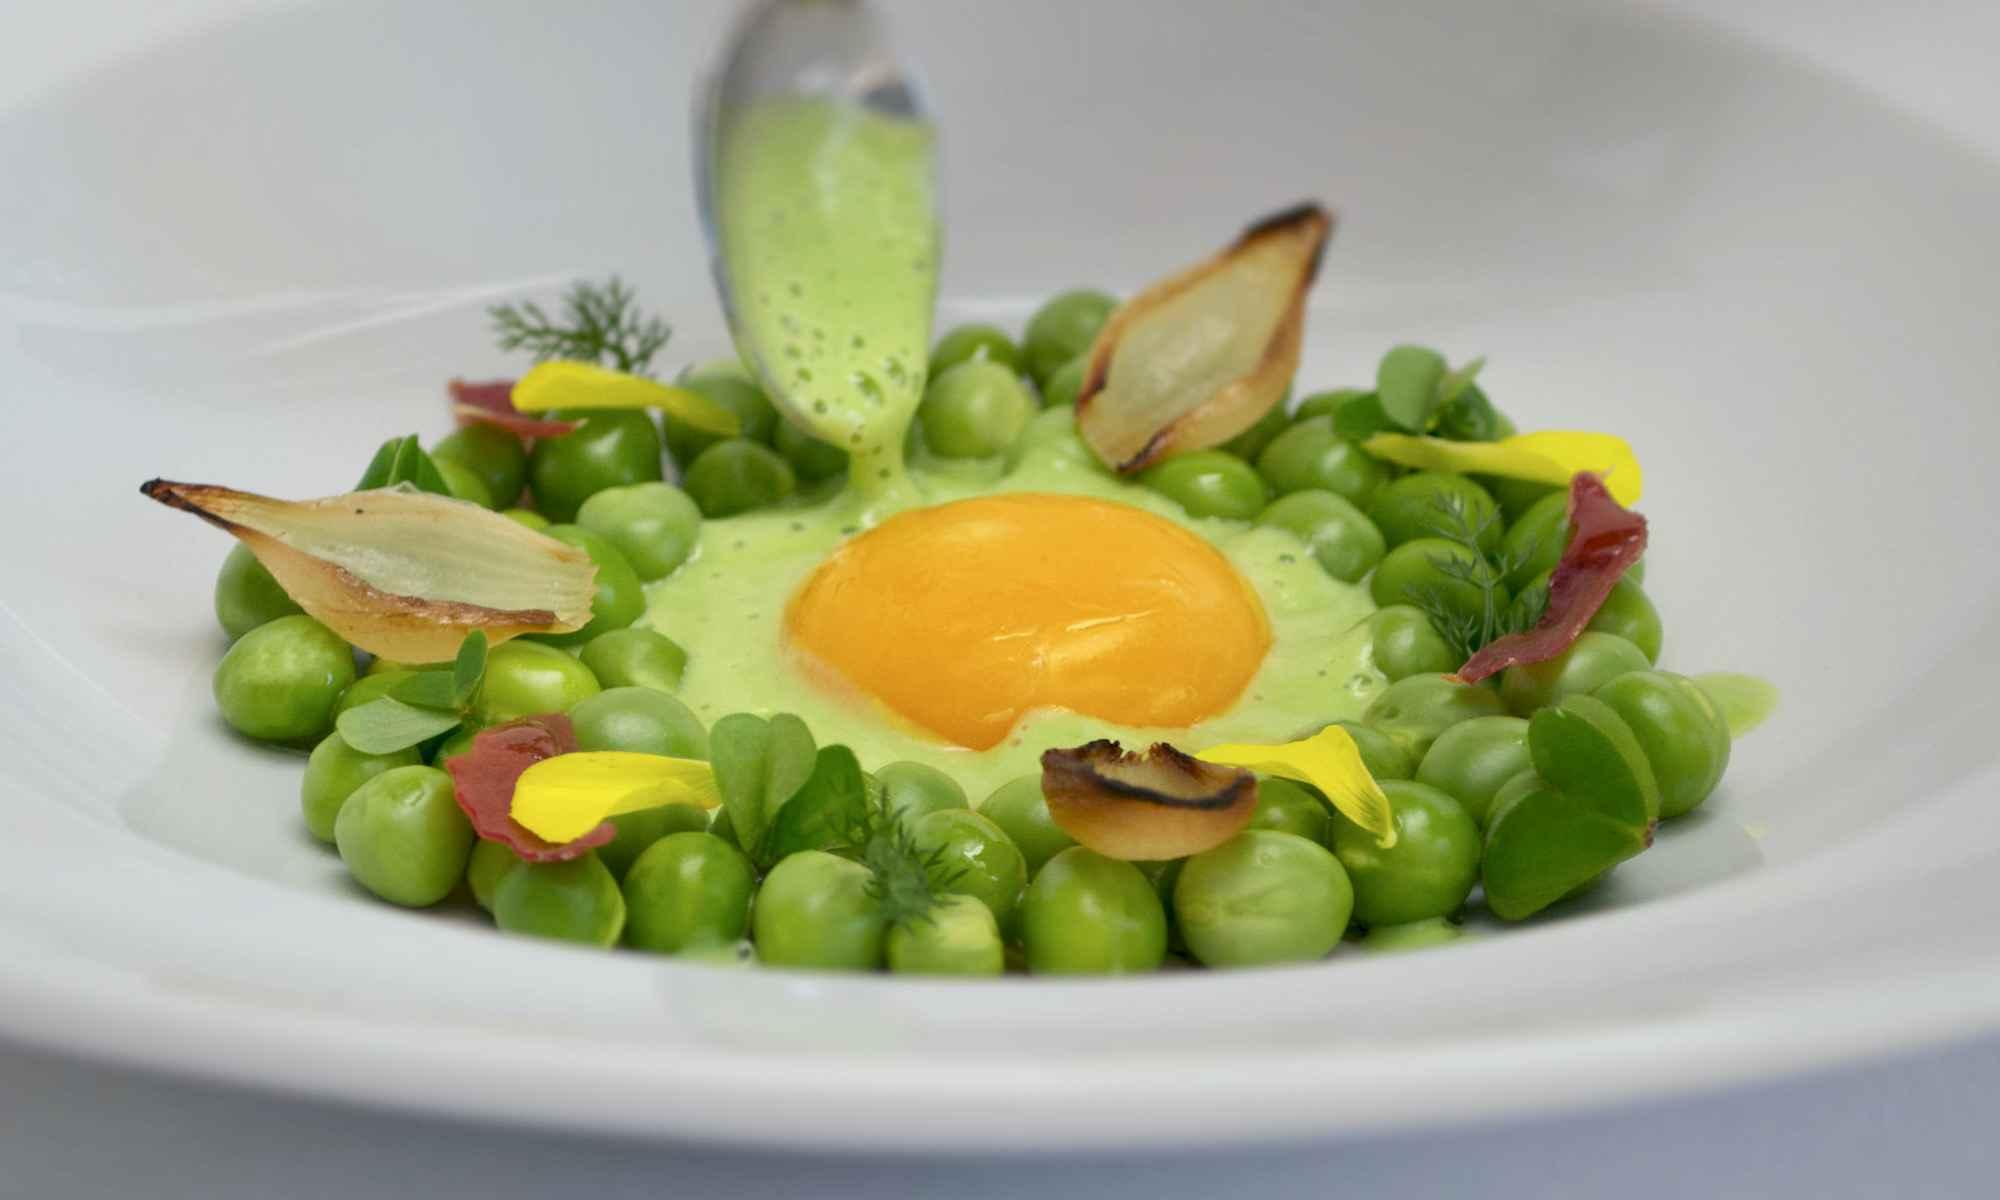 Pollensa Private Chefs - Confit egg yolk & peas